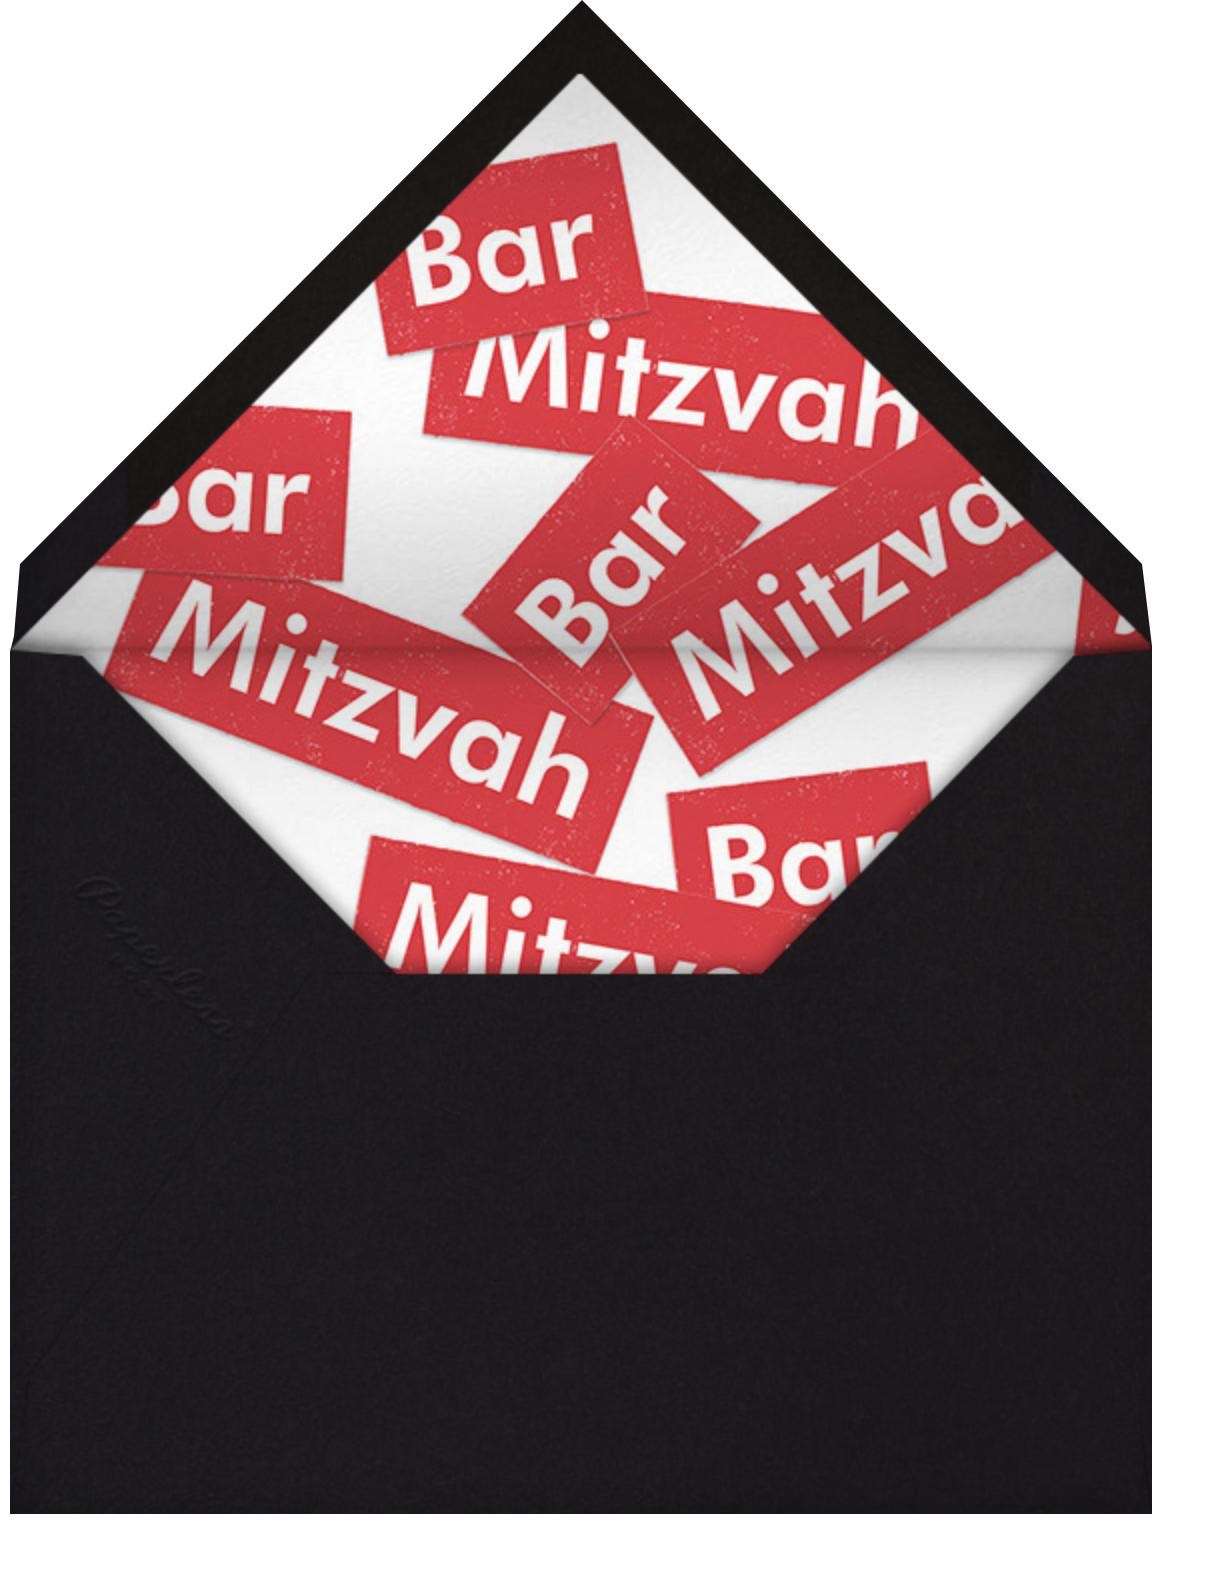 A Love Supreme (Bar) - Red - Paperless Post - Bar and bat mitzvah - envelope back